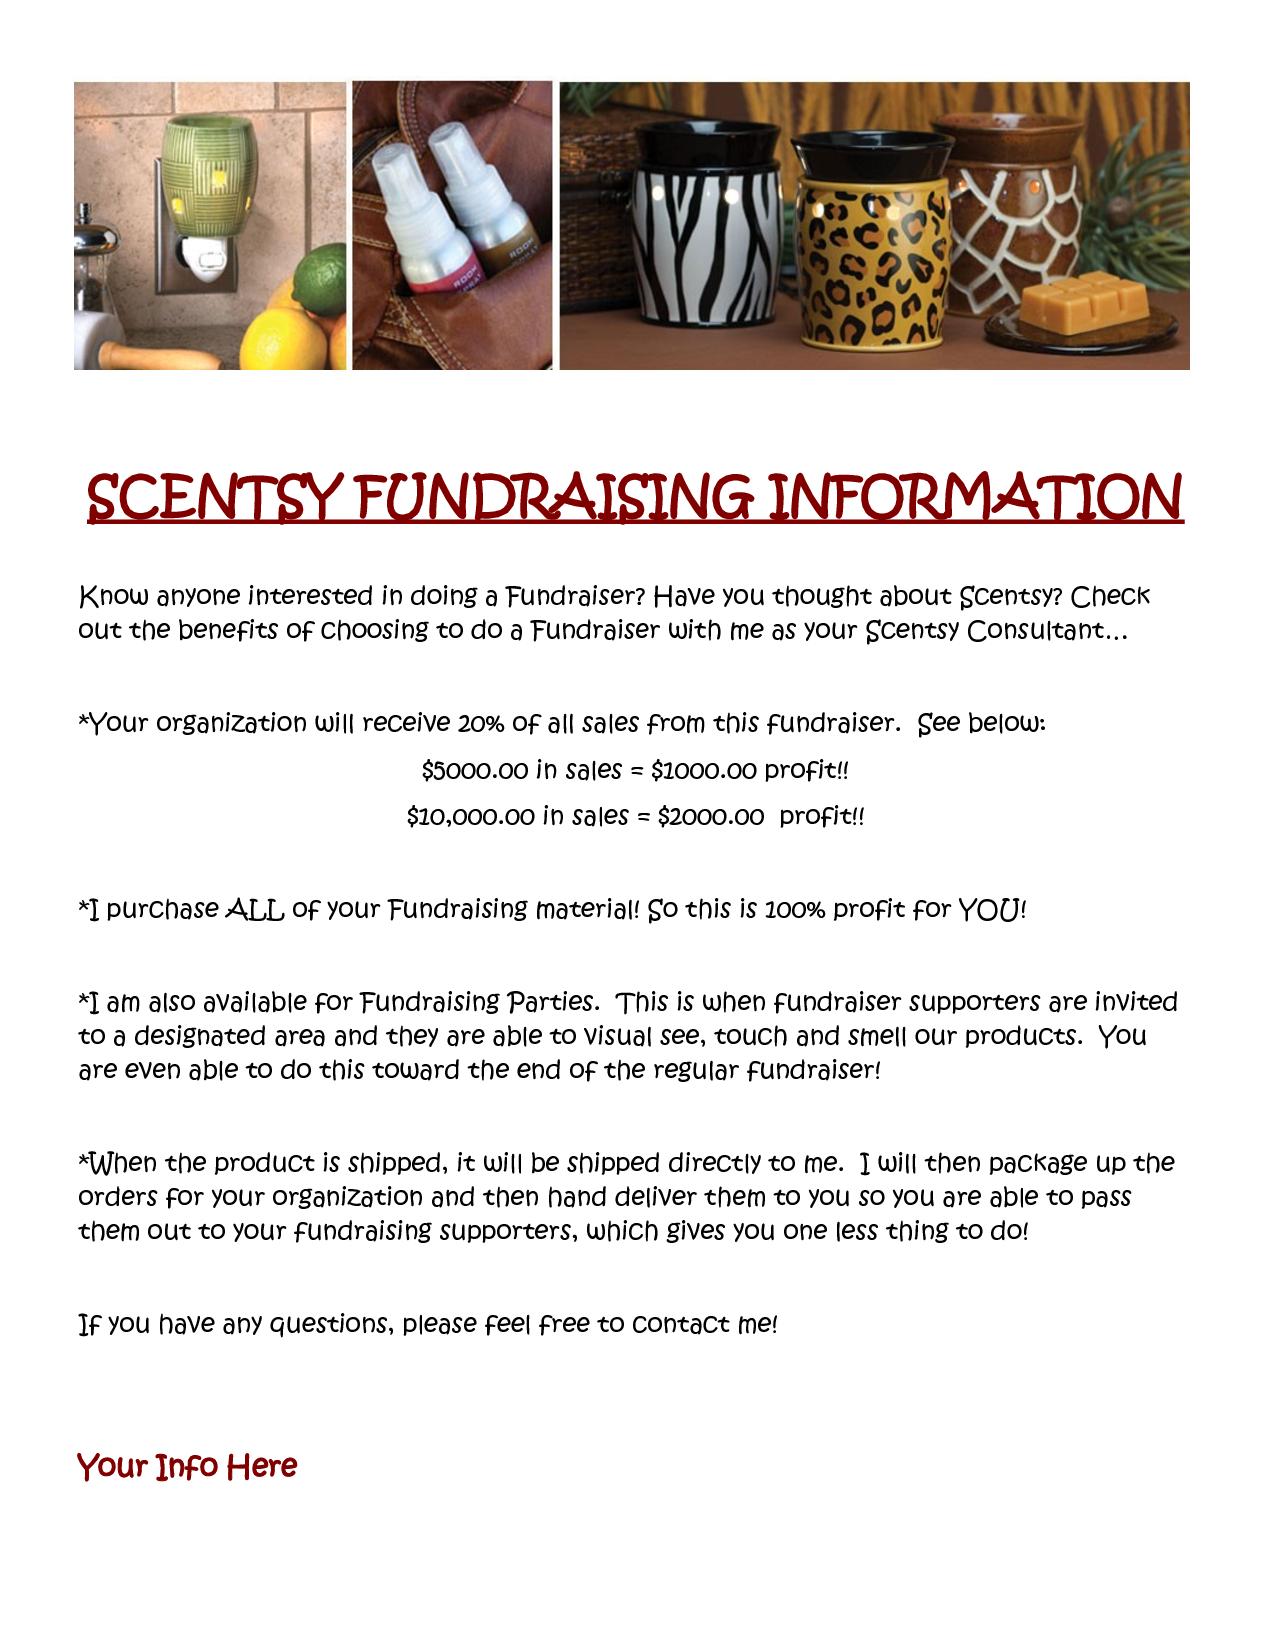 scentsy fundraising information